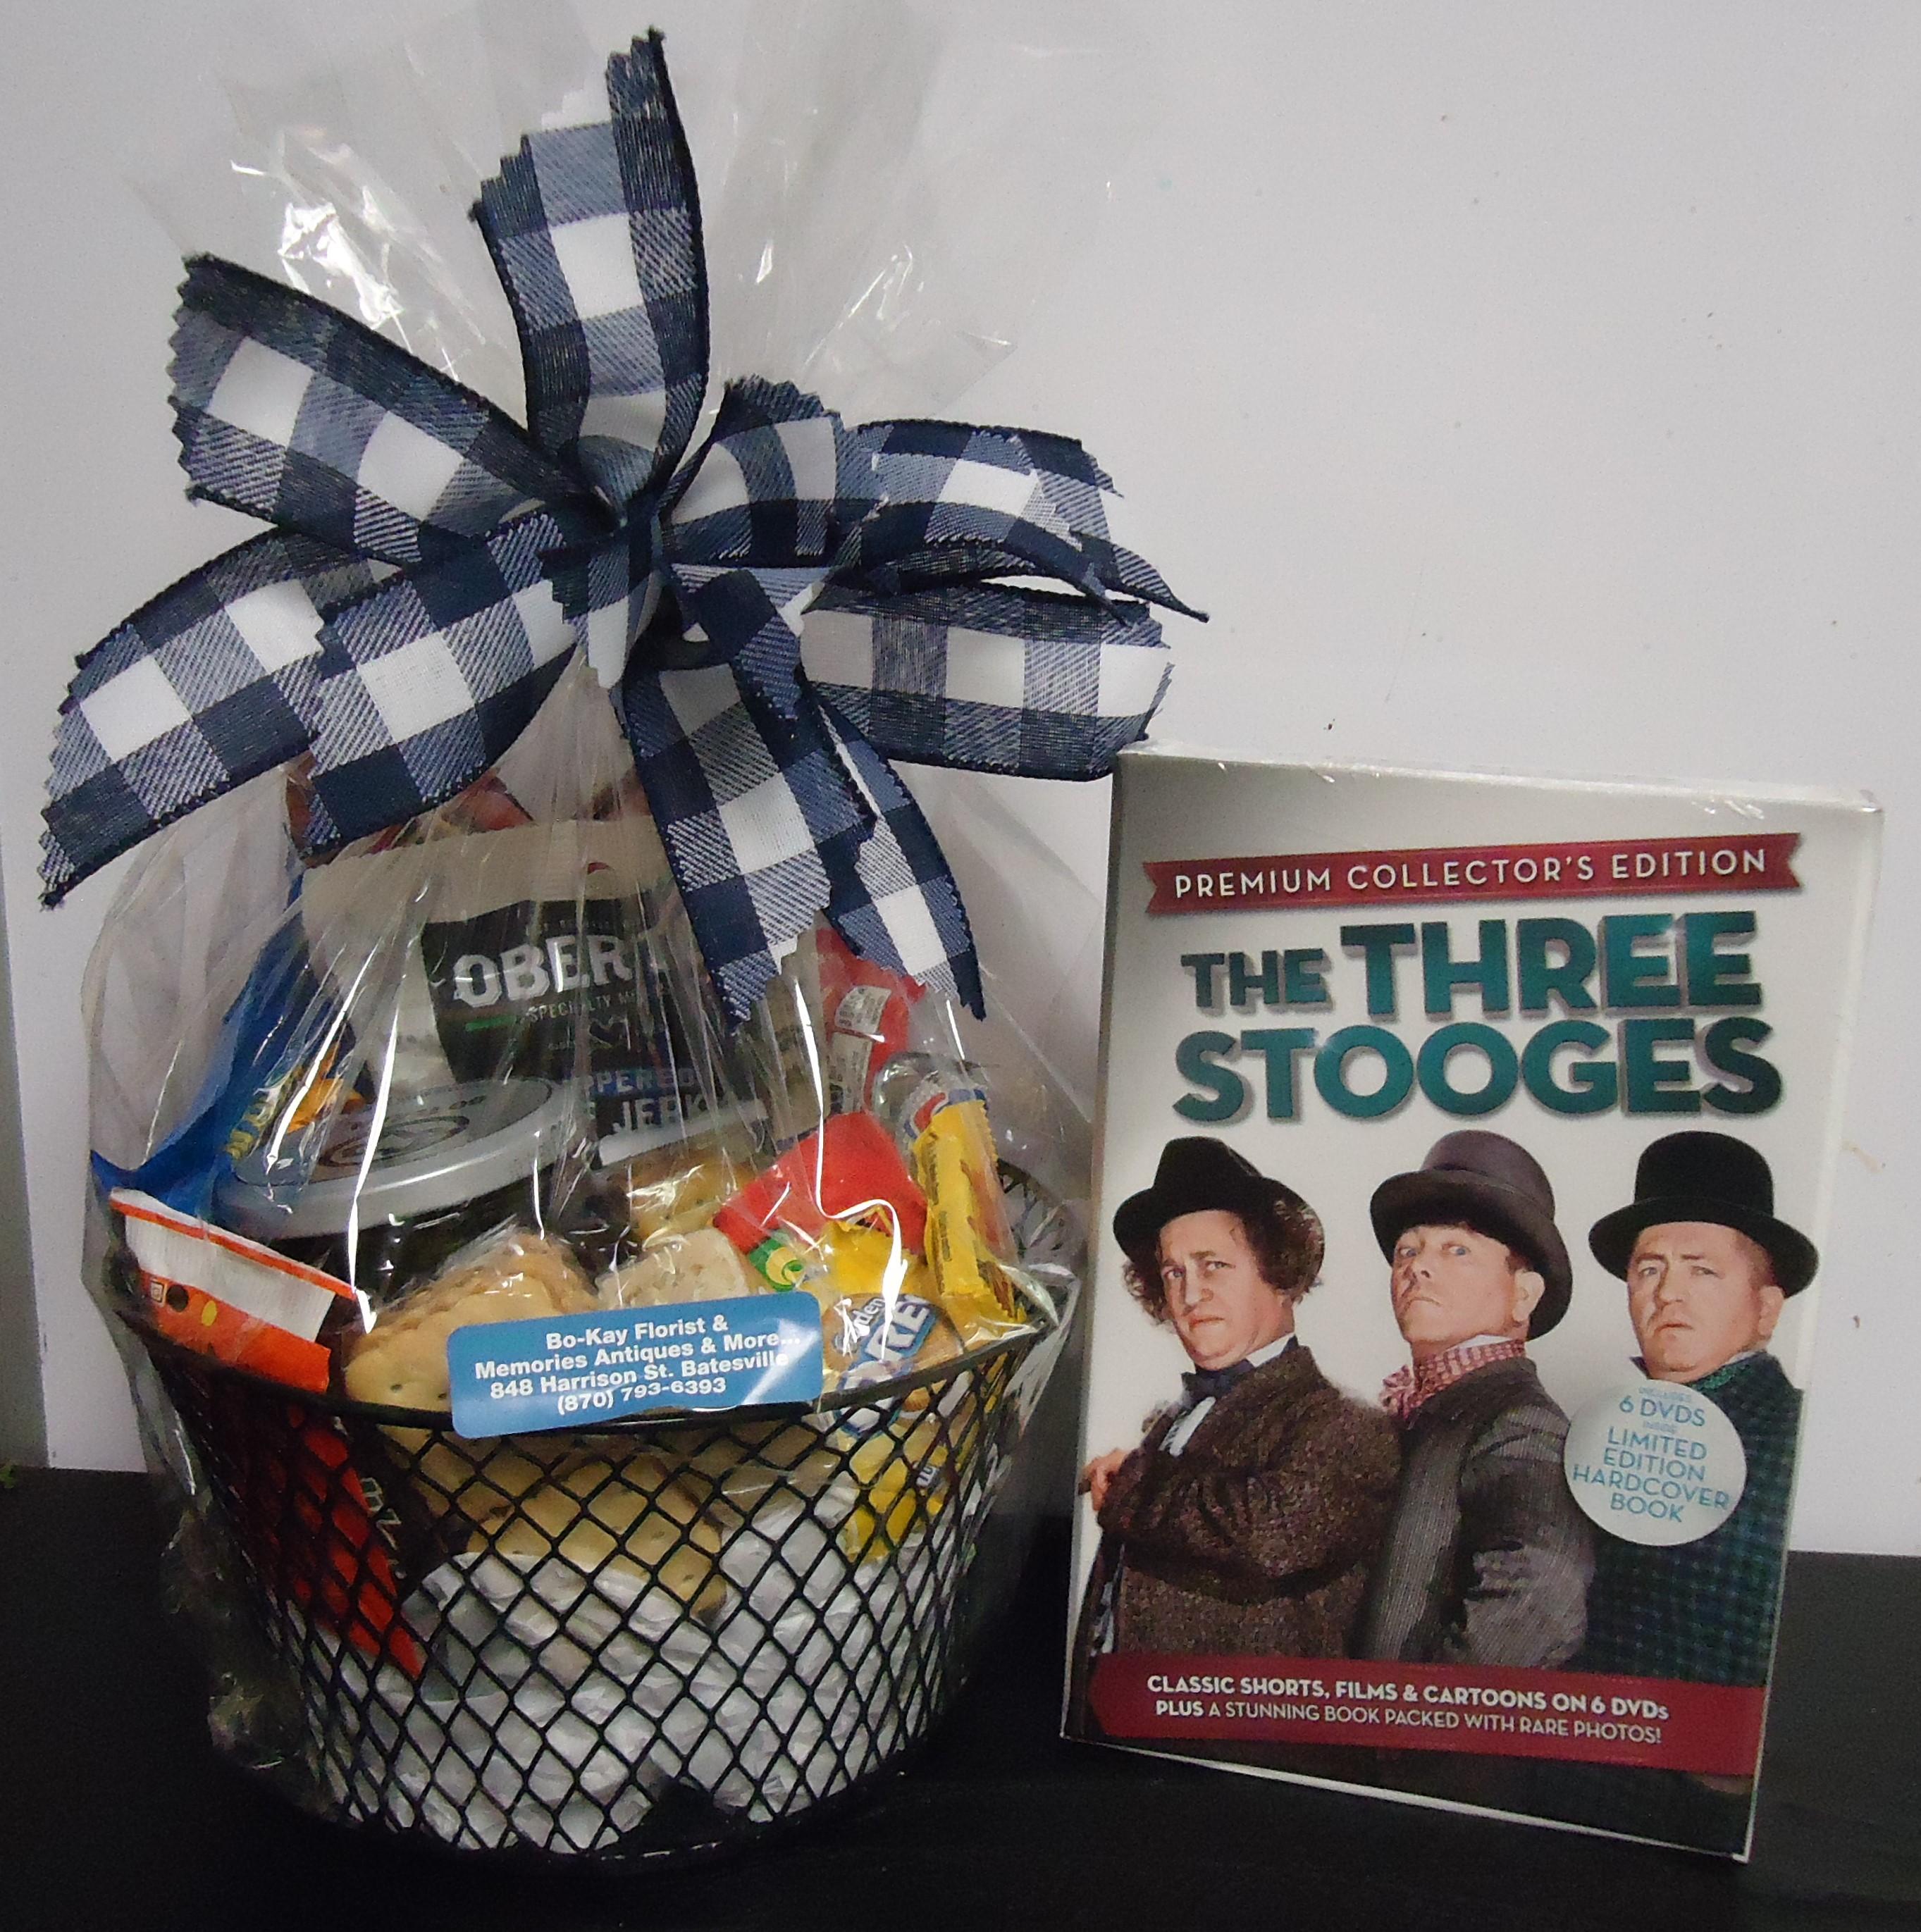 (11) Goodie Basket  W/ DVDS (Three Stooges) $40.00